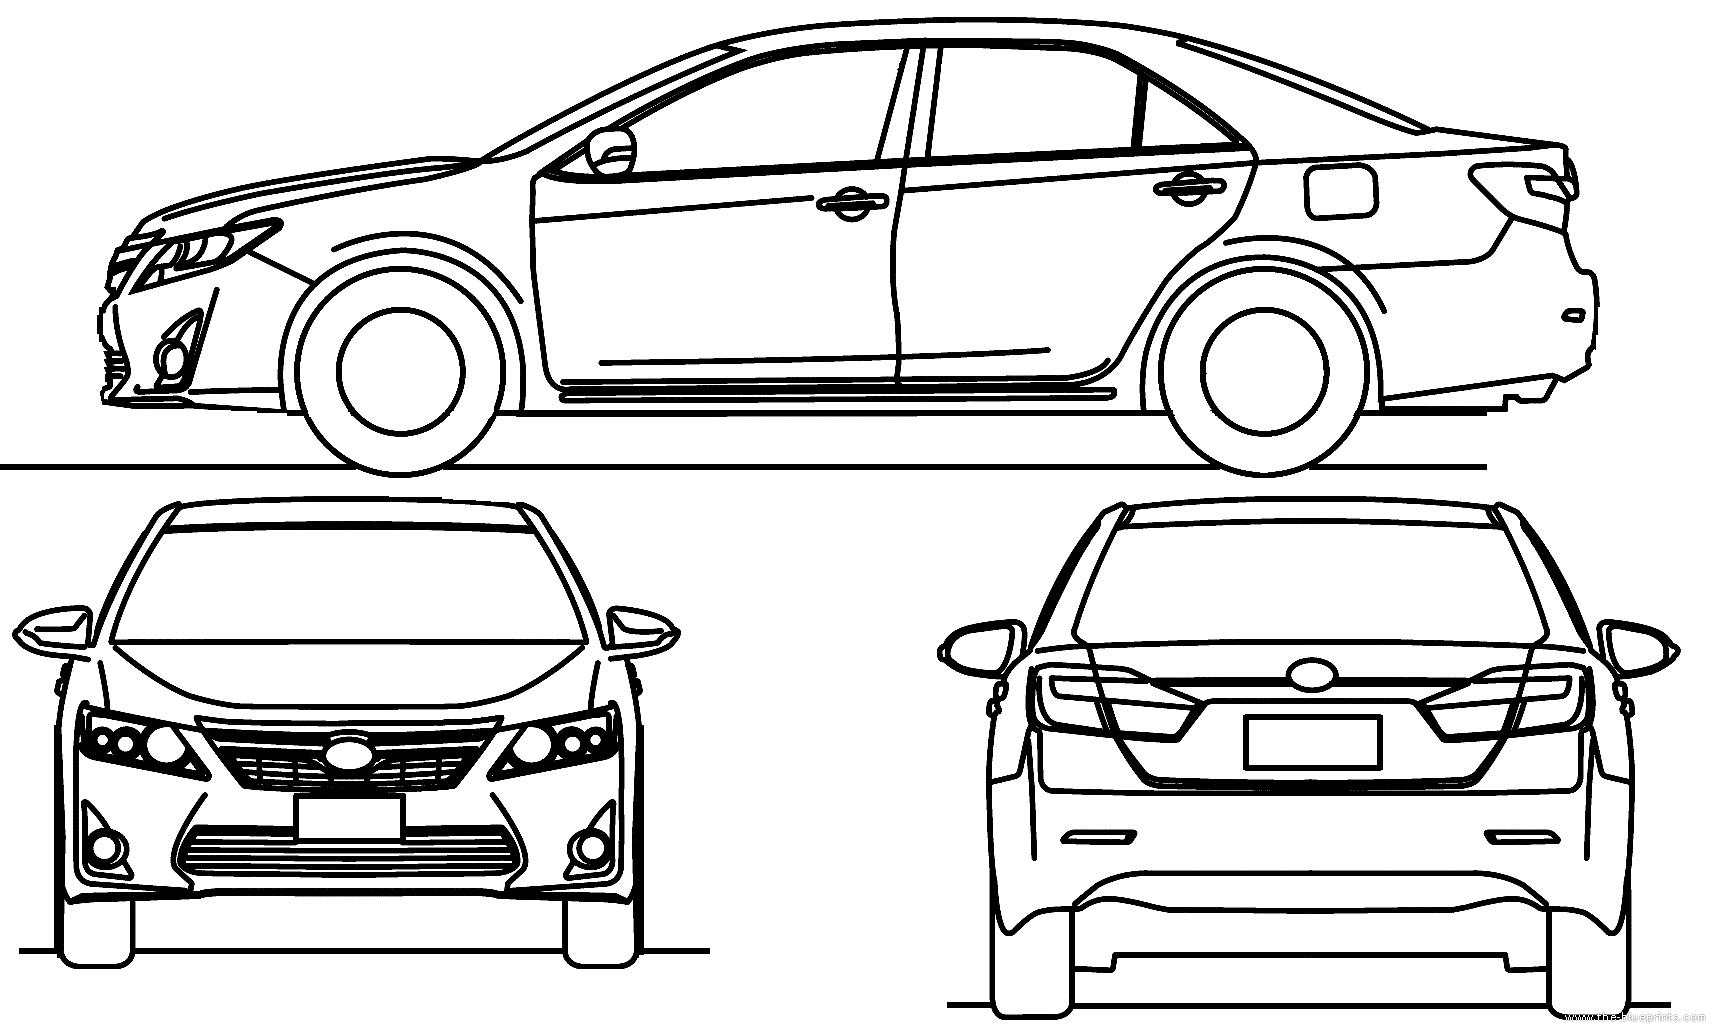 Blueprints Gt Cars Gt Toyota Gt Toyota Camry